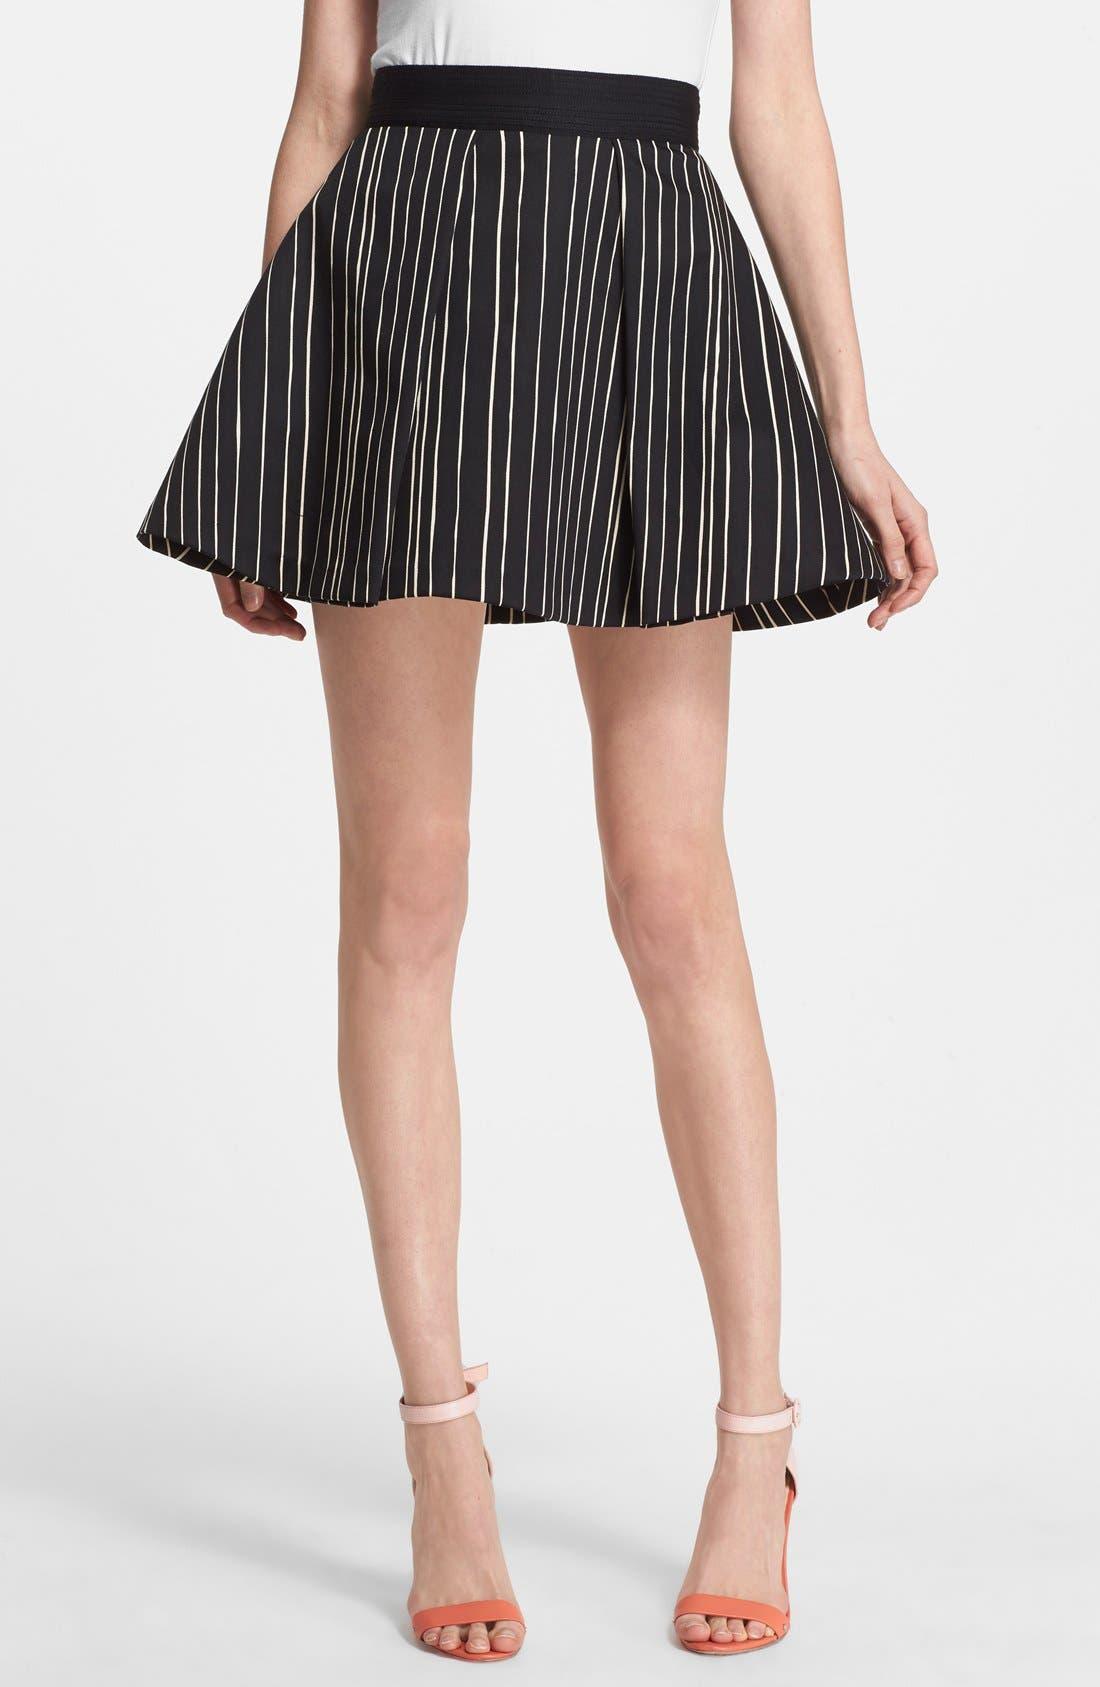 Main Image - Alice + Olivia 'Libby' Stripe Flared Skirt